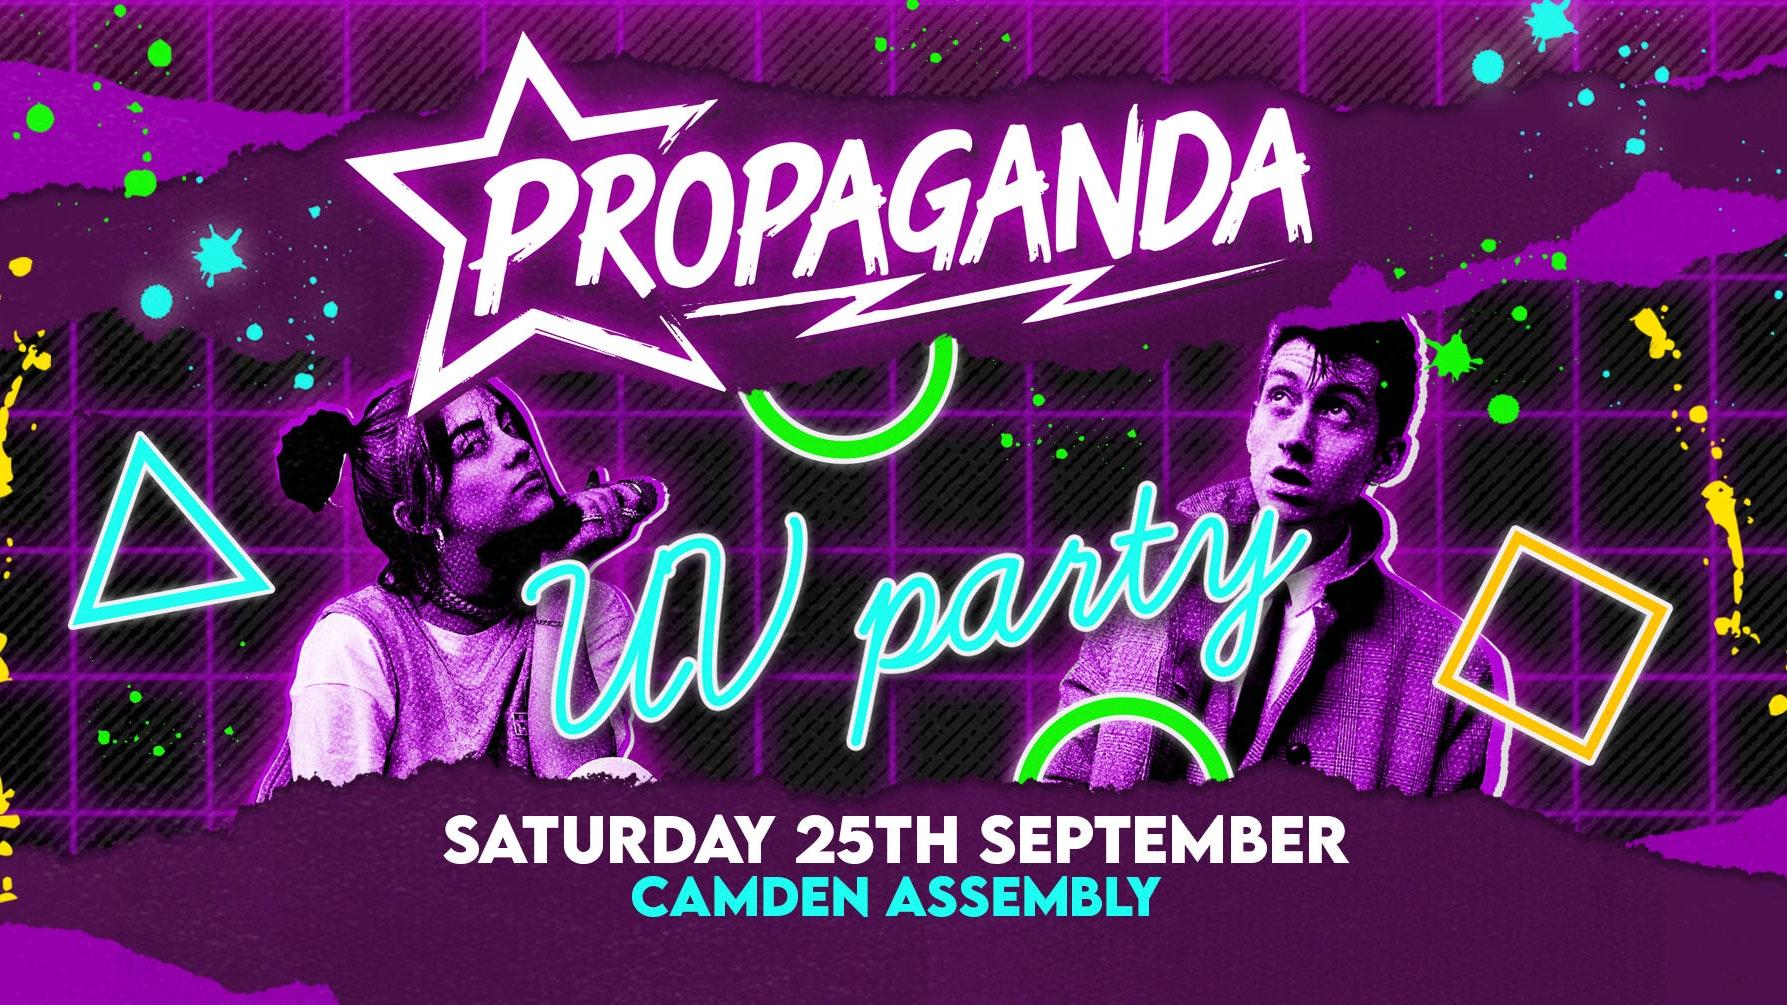 Propaganda London – UV Party!